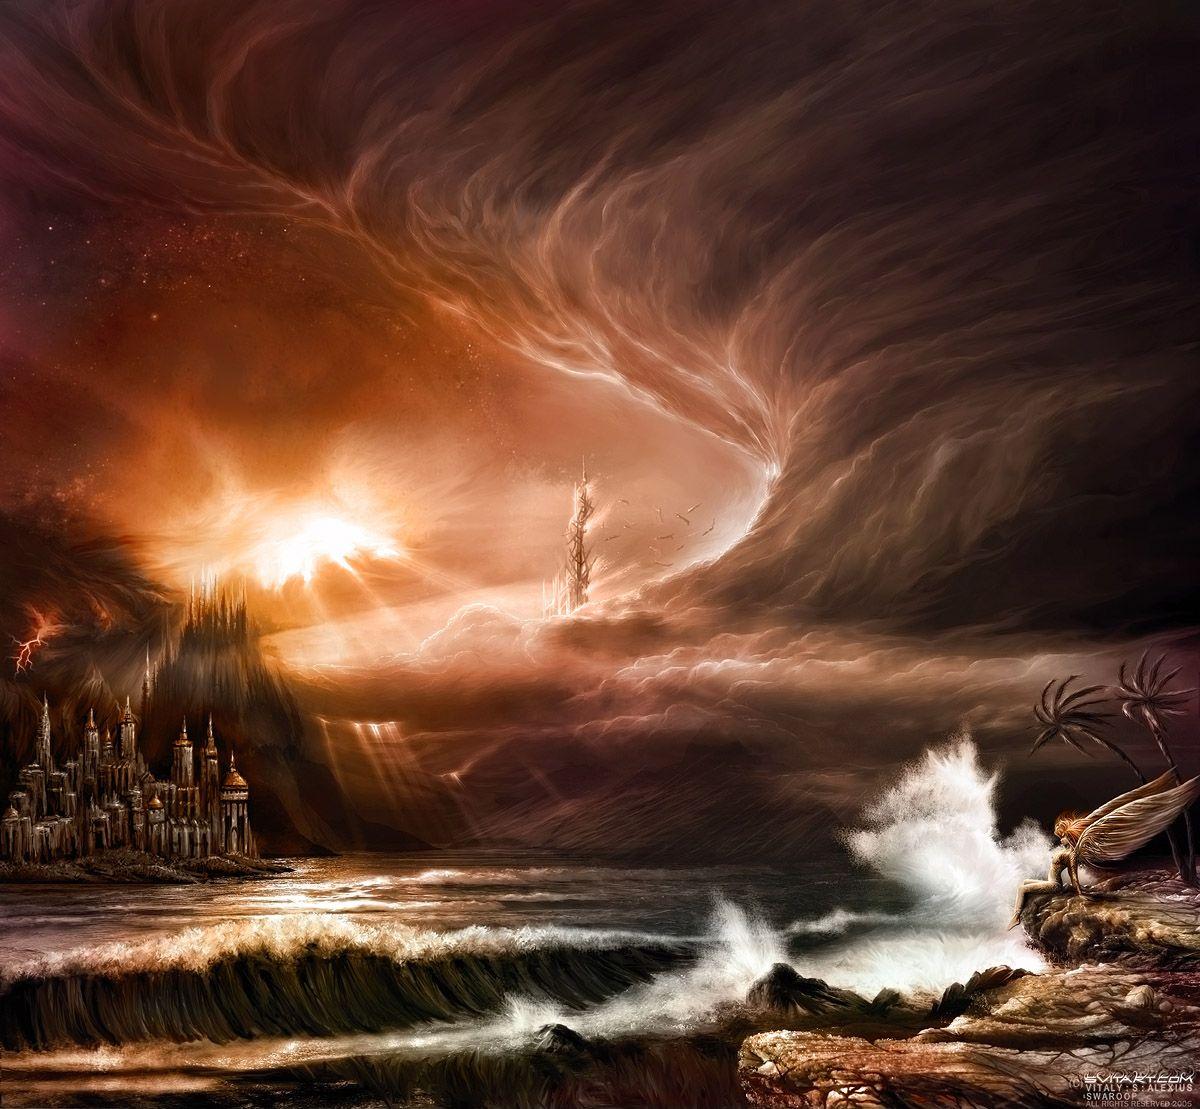 Fantasy Landscape Wallpaper: 25 Stunning Fantasy Landscape Illustrations